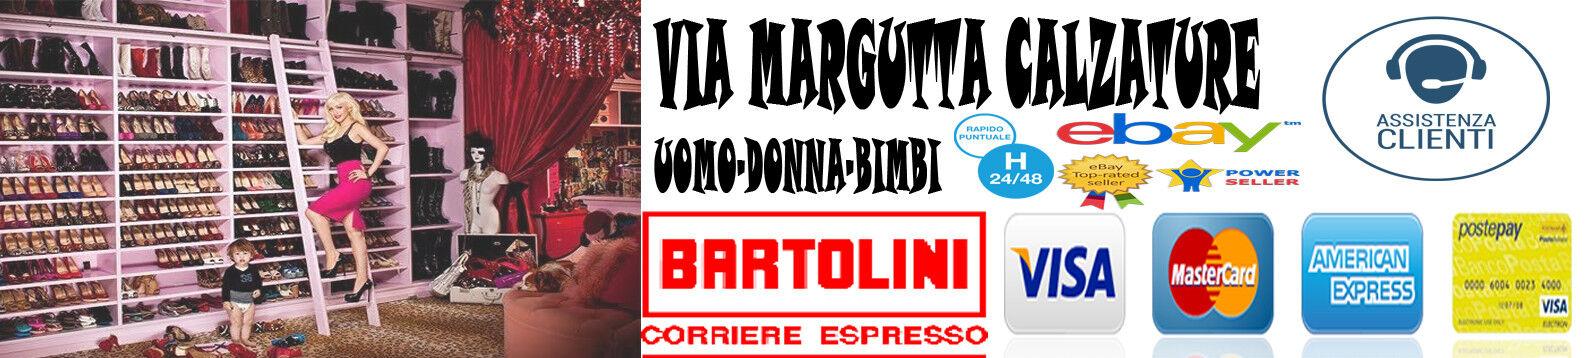 Via Margutta Calzature